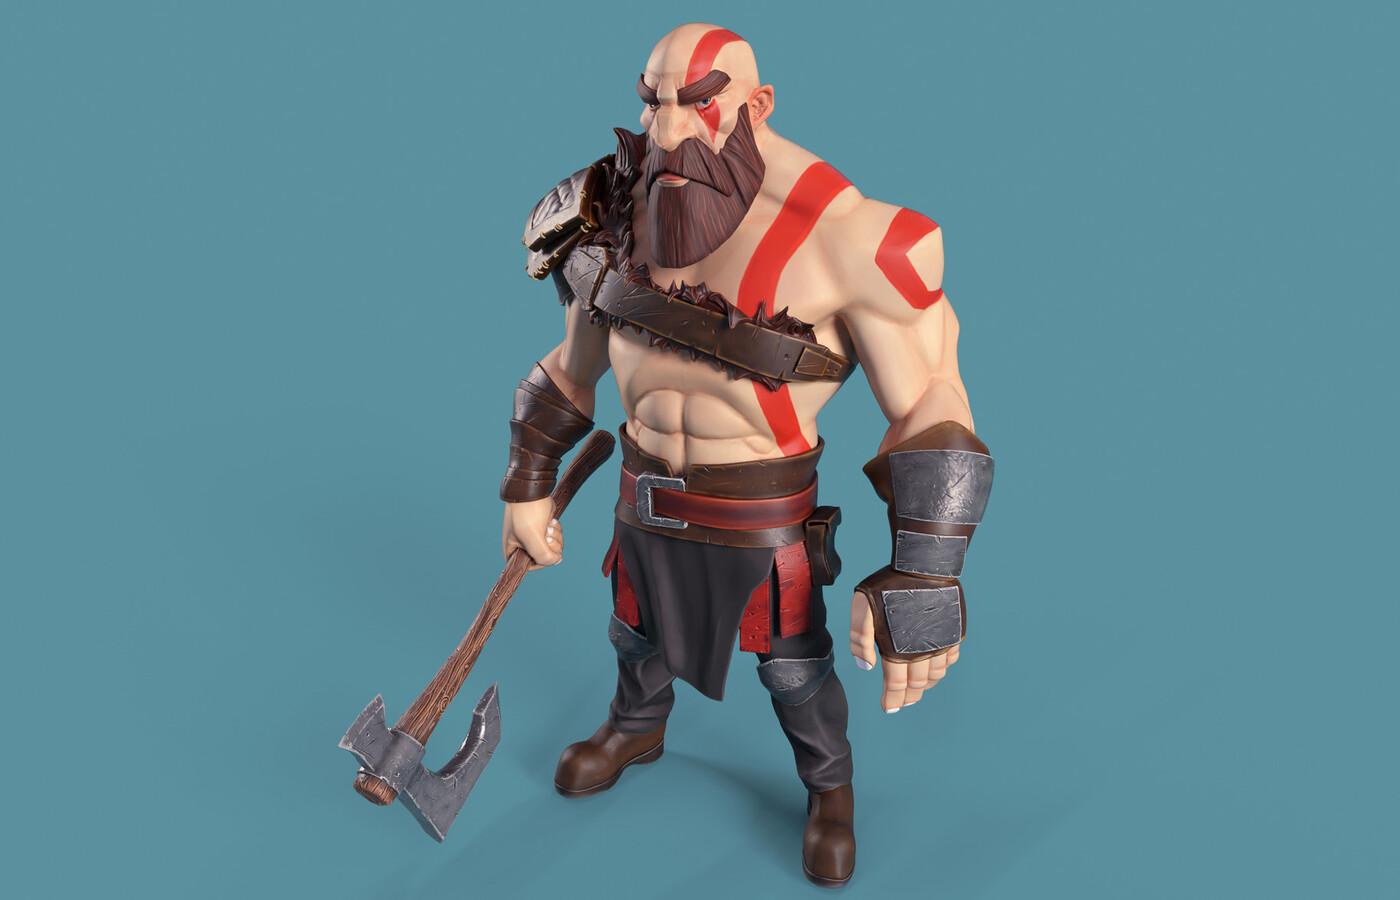 kratos-god-of-war-digital-art-xg.jpg